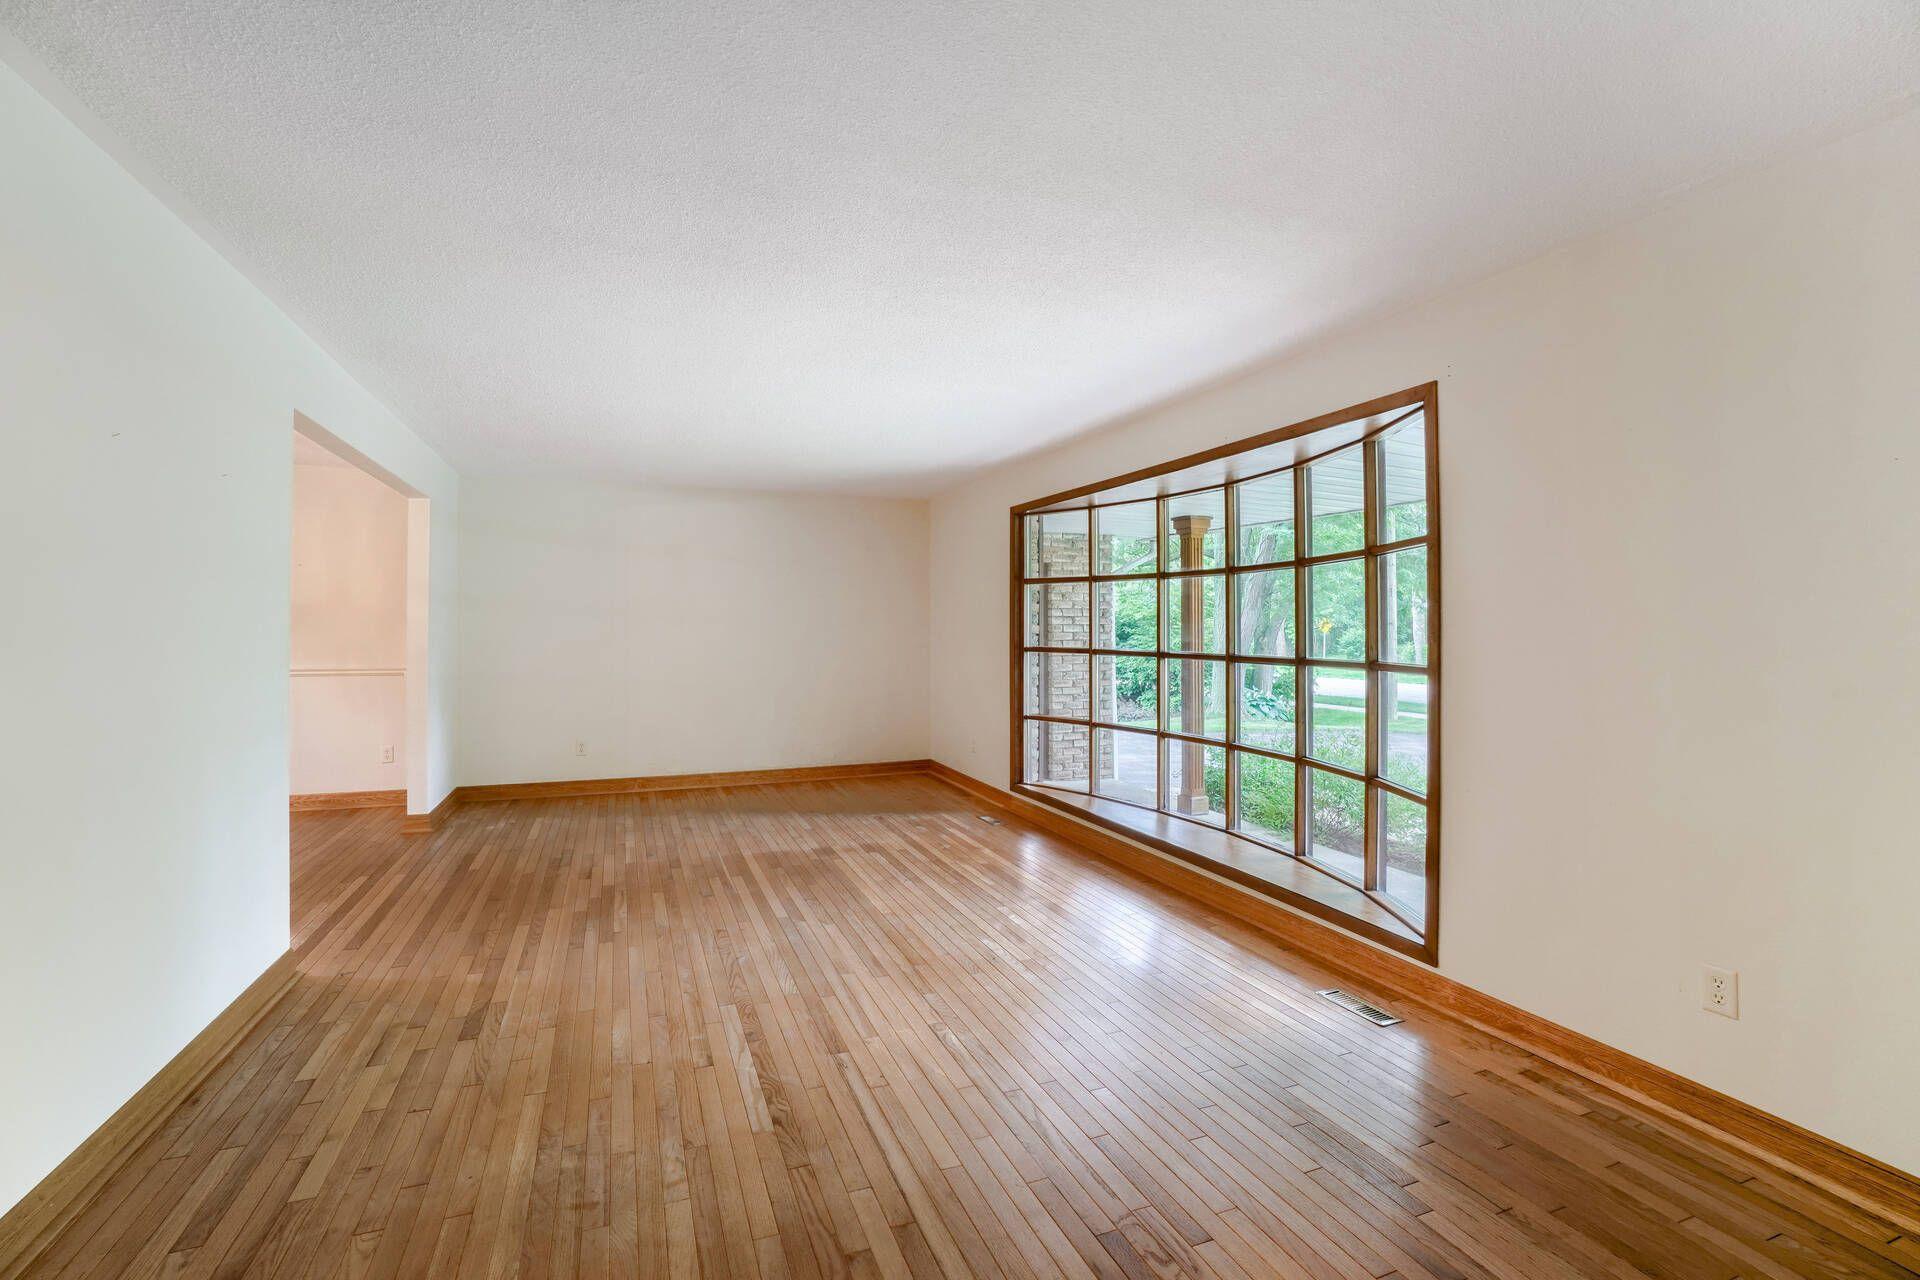 Living Room - 169 Wedgewood Dr, Oakville - Elite3 & Team at 169 Wedgewood Drive, Eastlake, Oakville